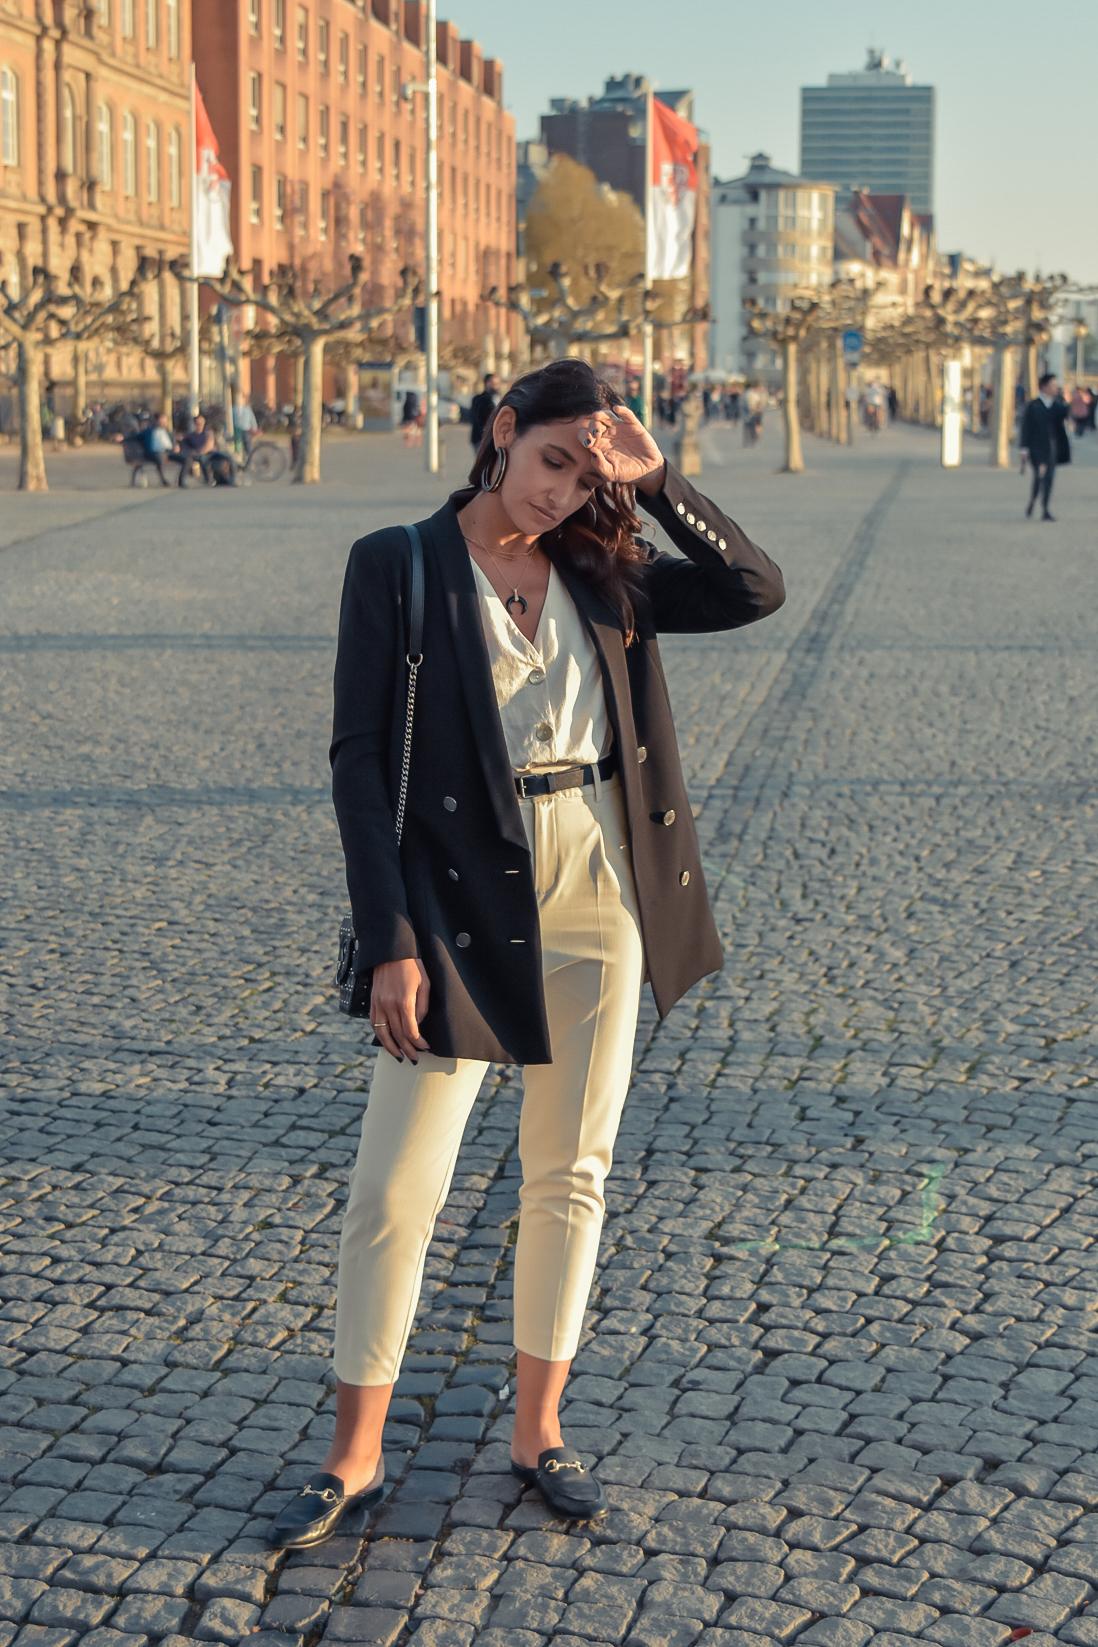 el-blog-de-silvia-viajar-dusseldorf-pantalones-beige-blazer-negra-01